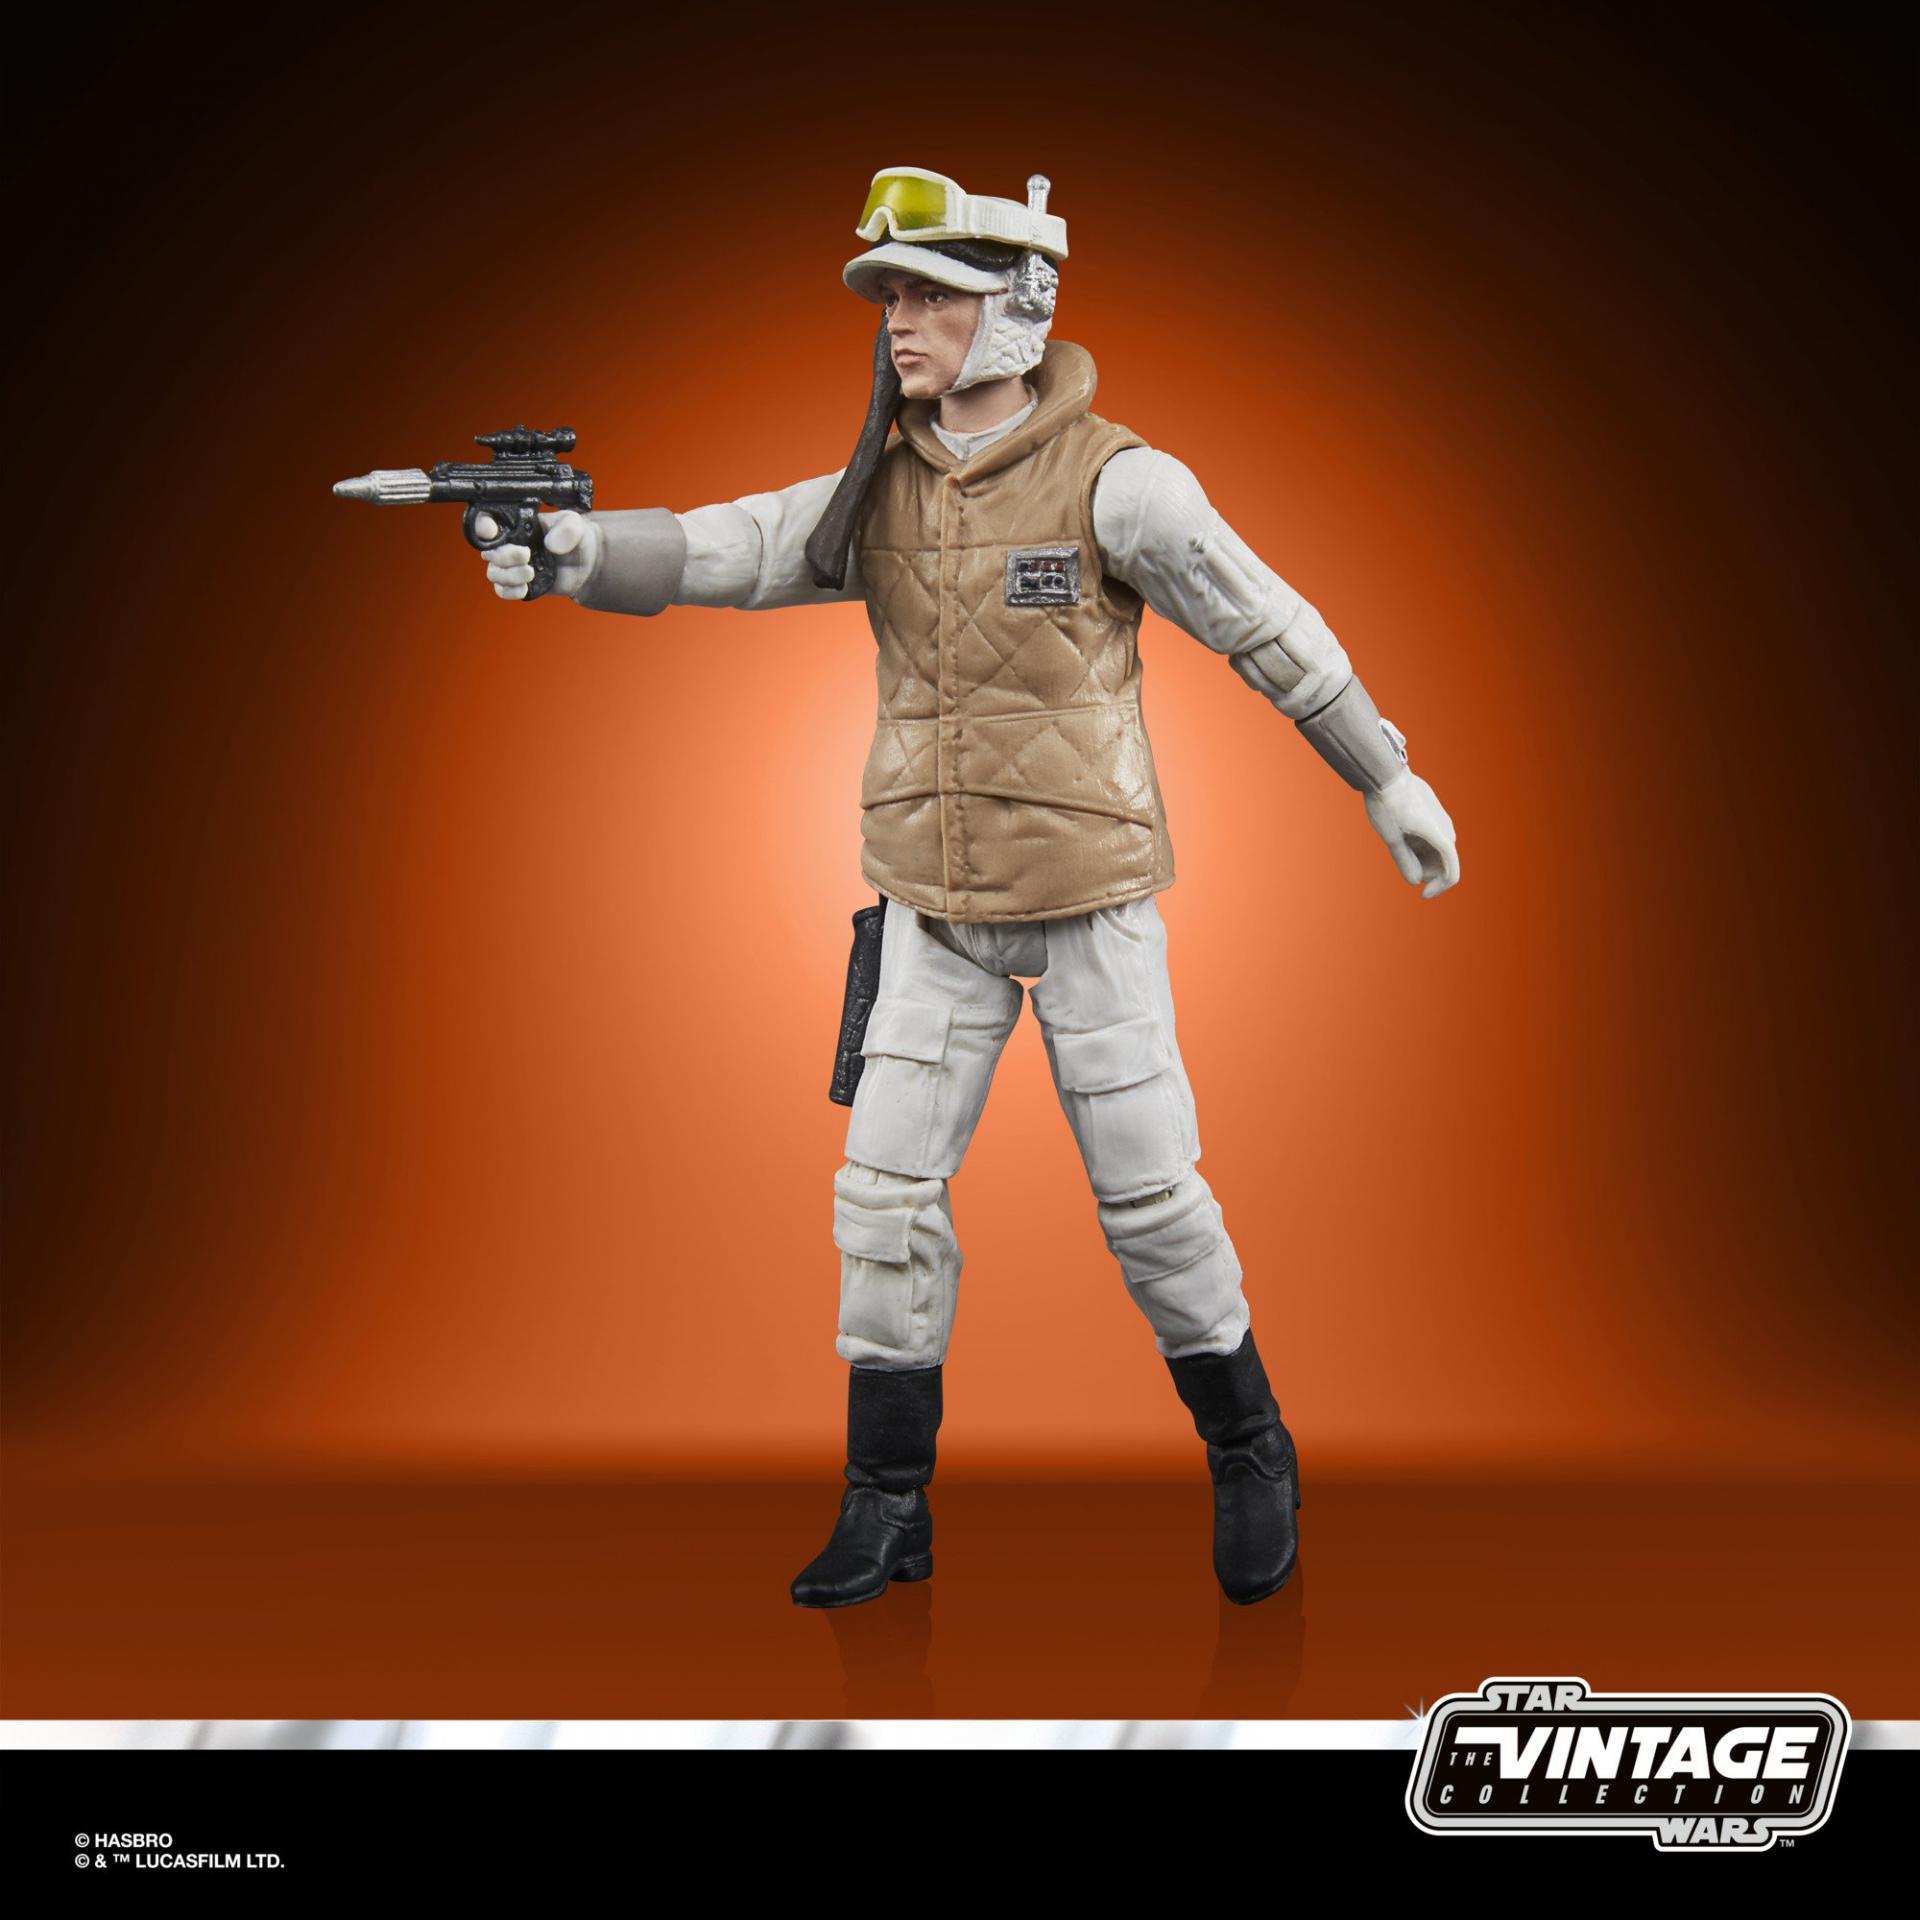 Star wars the vintage collection rebel soldier echo base battle gear 3